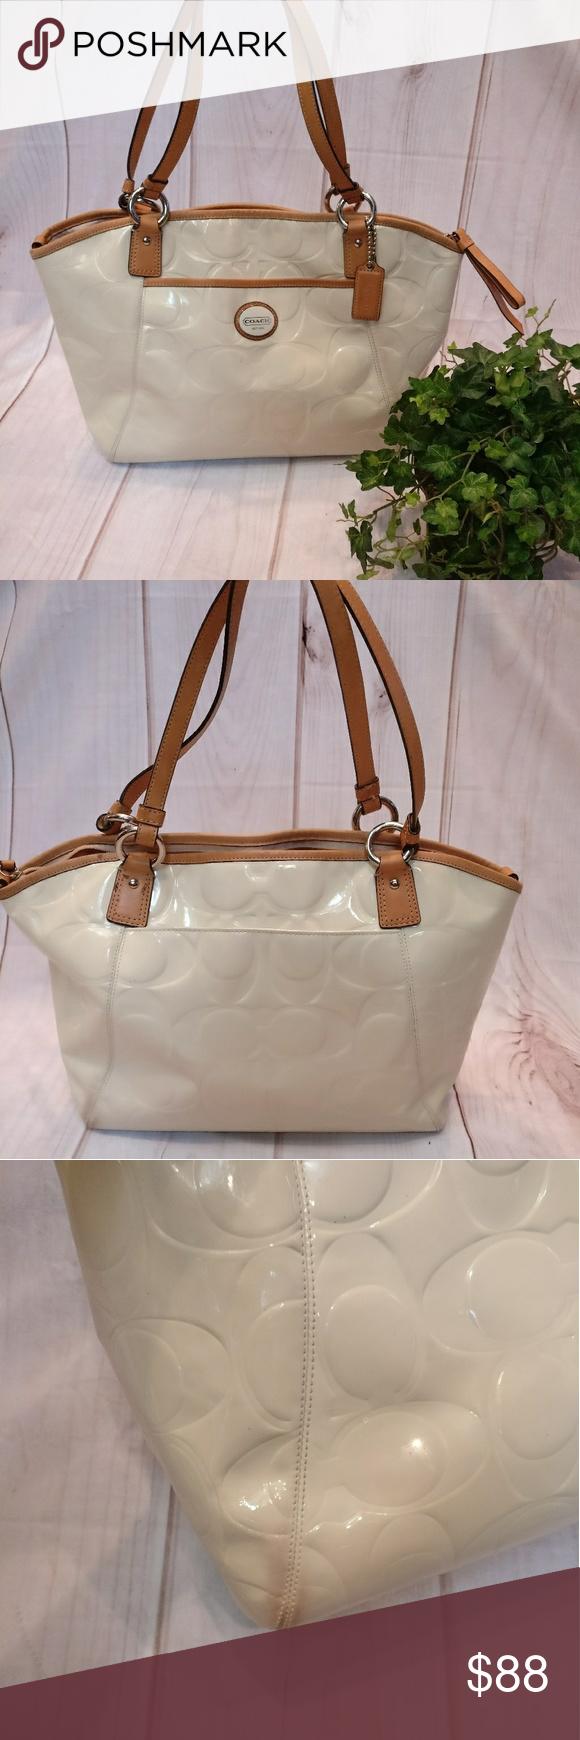 8603e0ed0a26 Cream and Brown Coach Patent Leather Purse Cream Coach purse shoulder bag  tote Baby pink interior